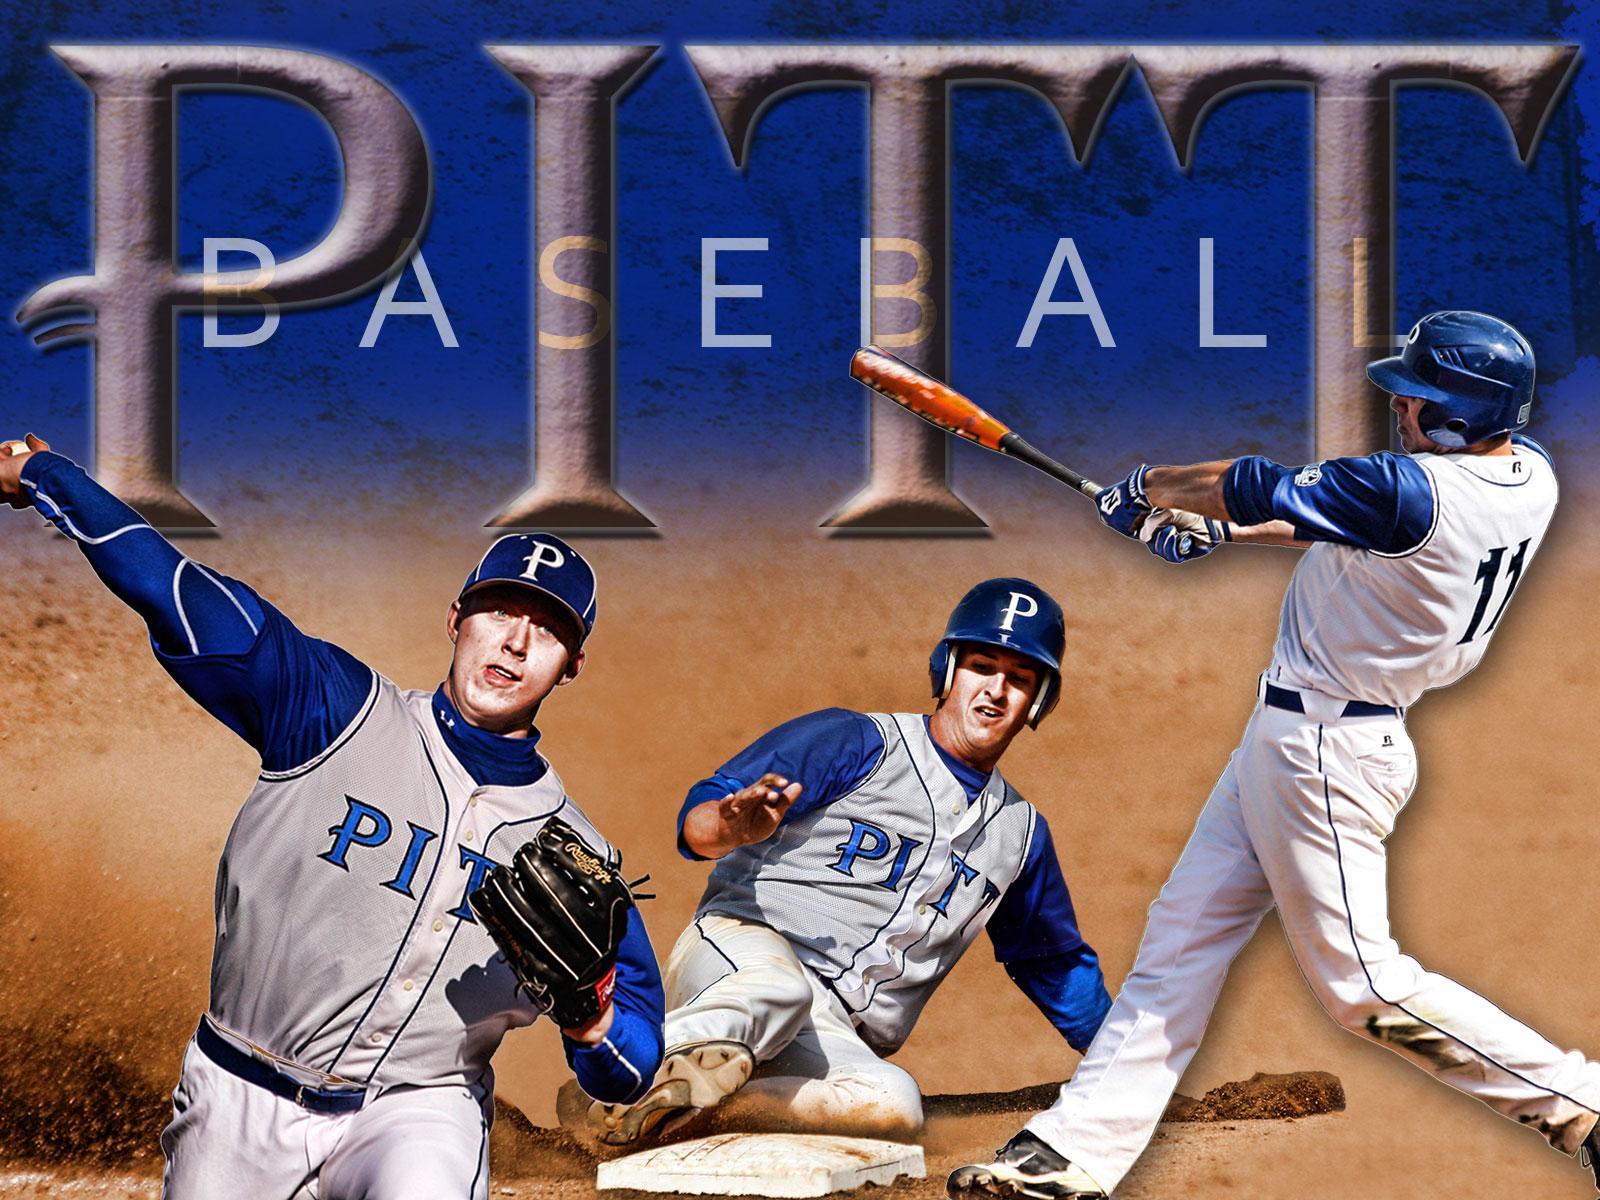 2011 PCC Baseball Wallpaper   1600 1600x1200